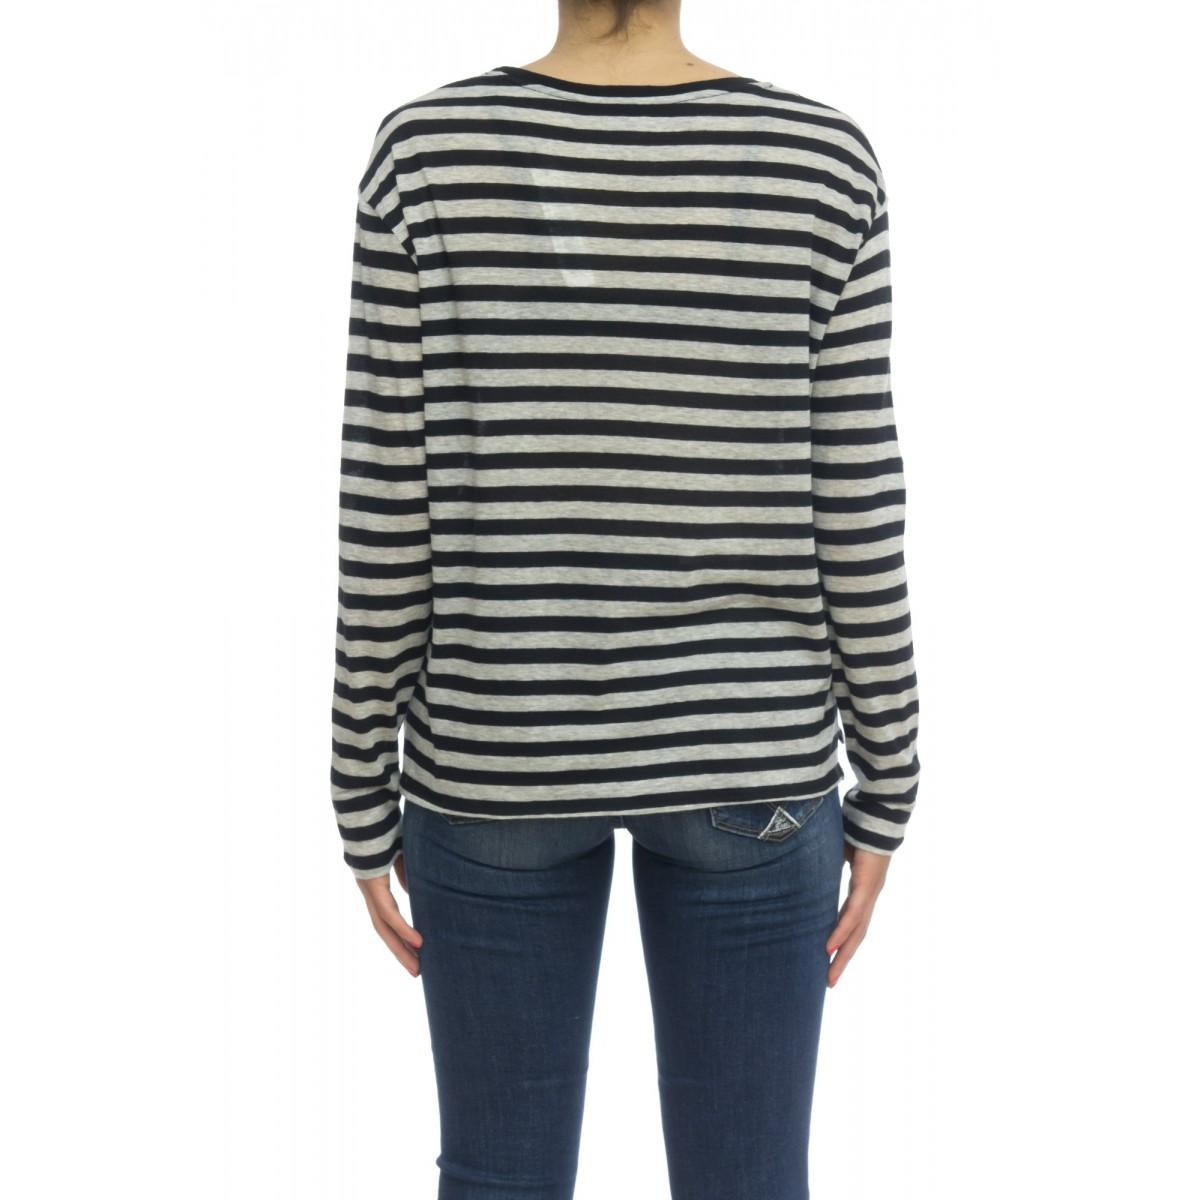 T shirt manica lunga - Fts052 j012 70% cotone 30% cashmeire rigata